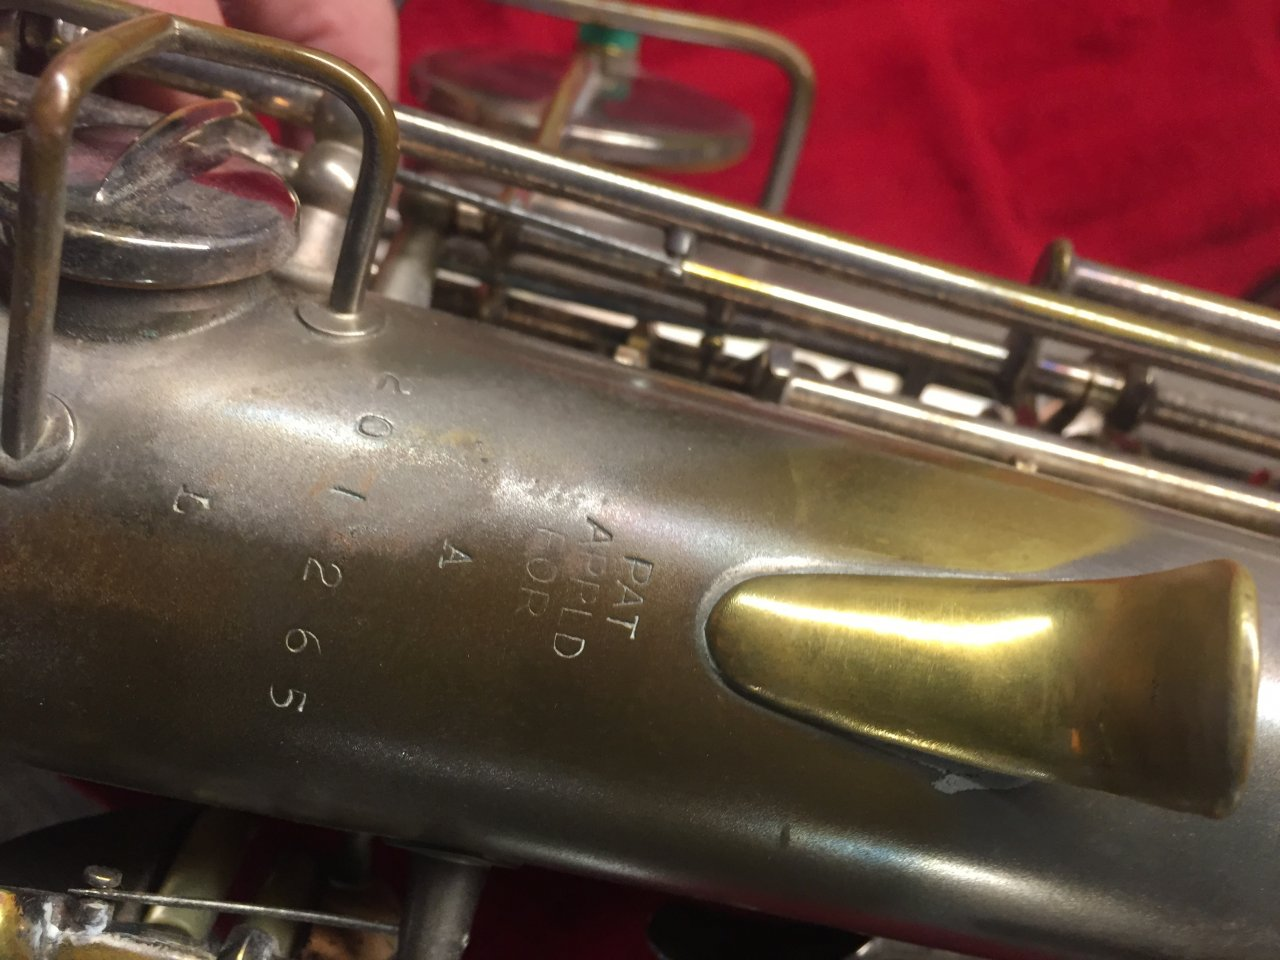 I'd Like To Know Value Of My Alto Sax - Lyon & Healy